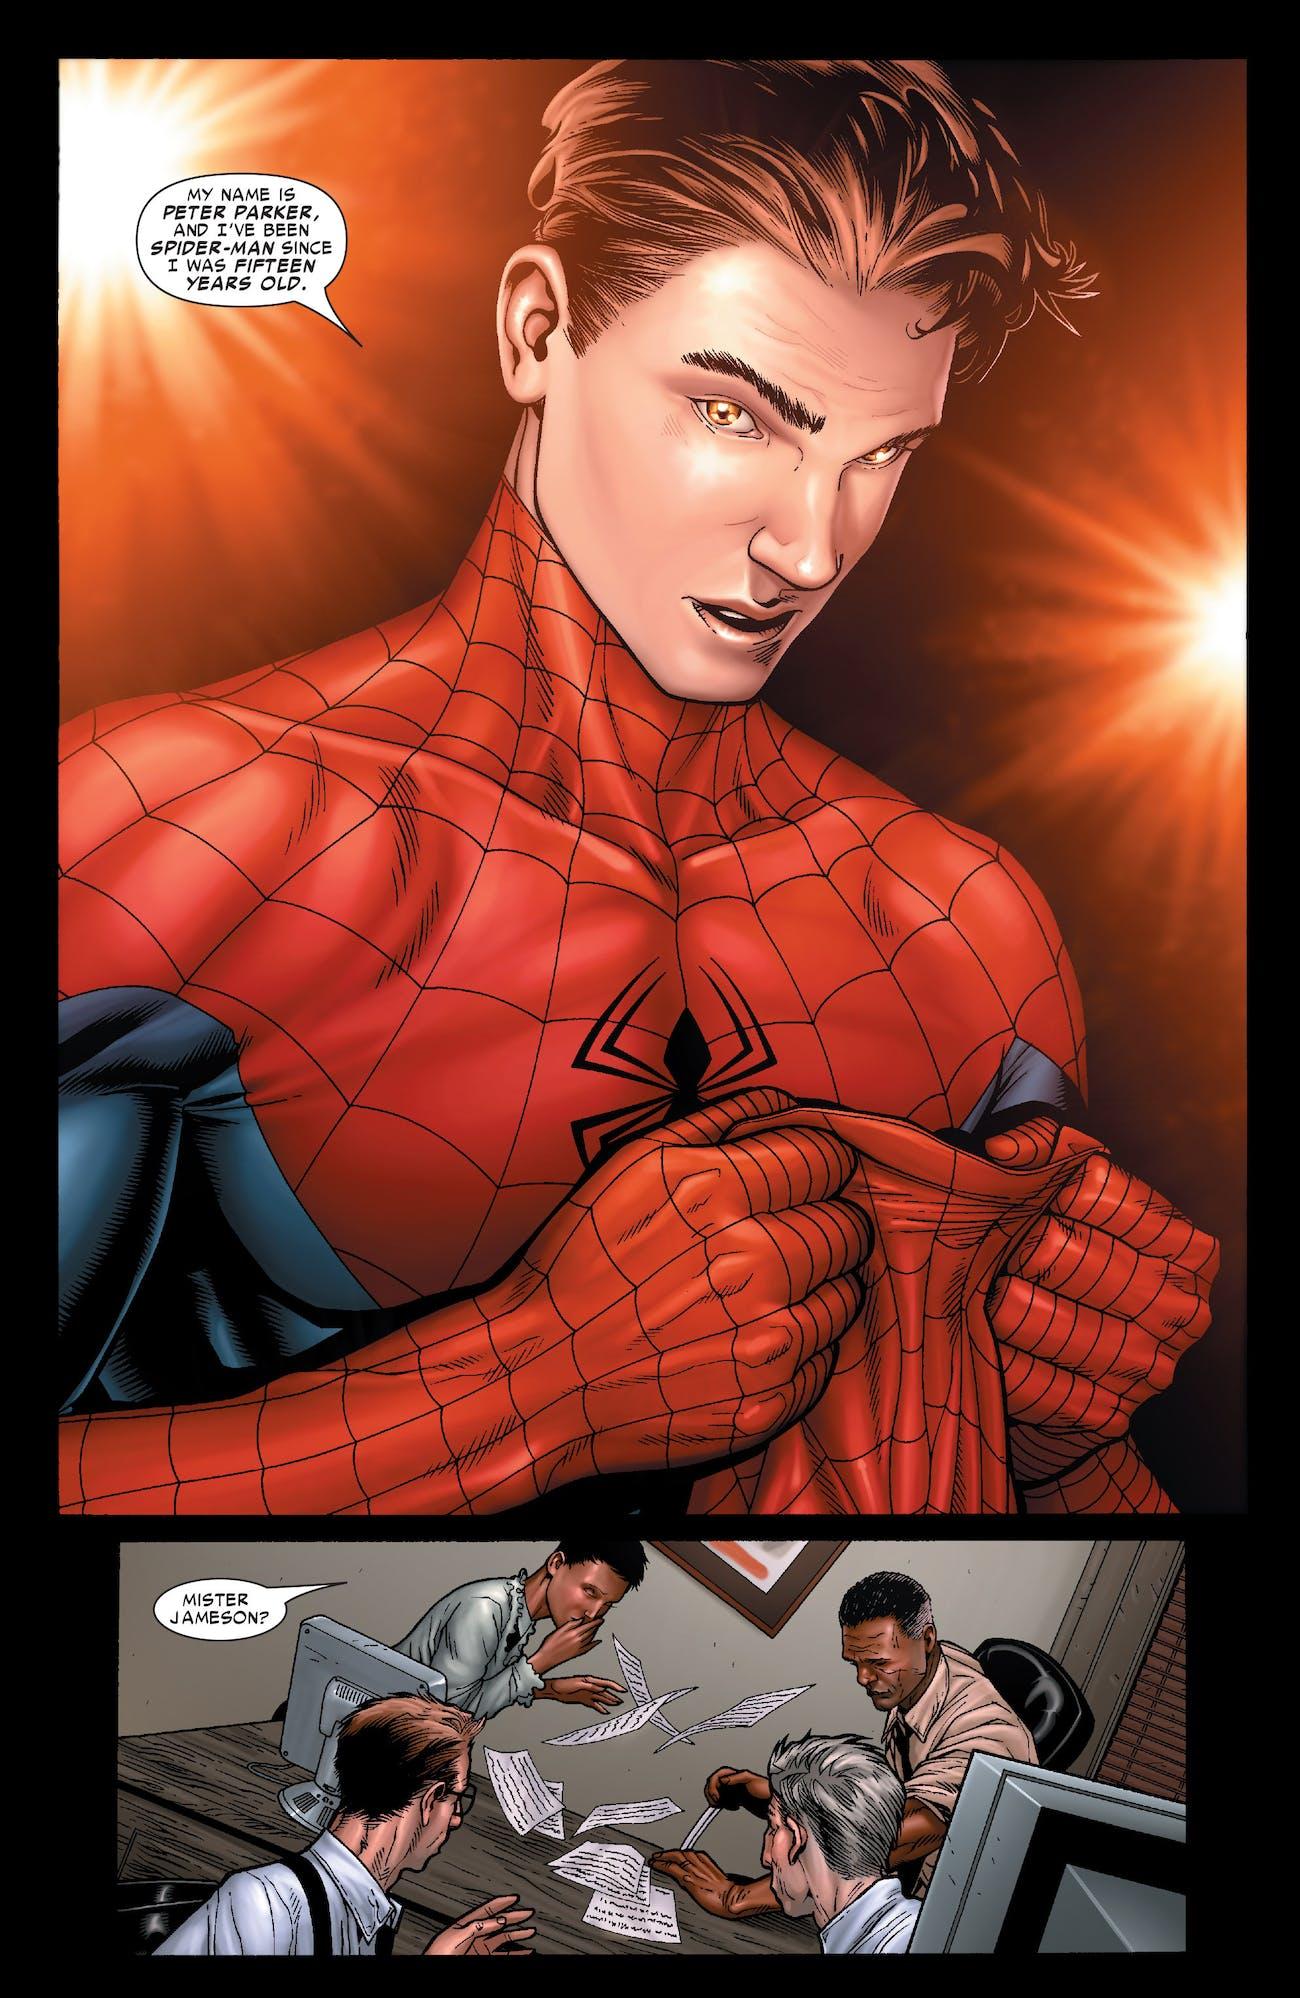 Spider-Man Marvel Entertainment